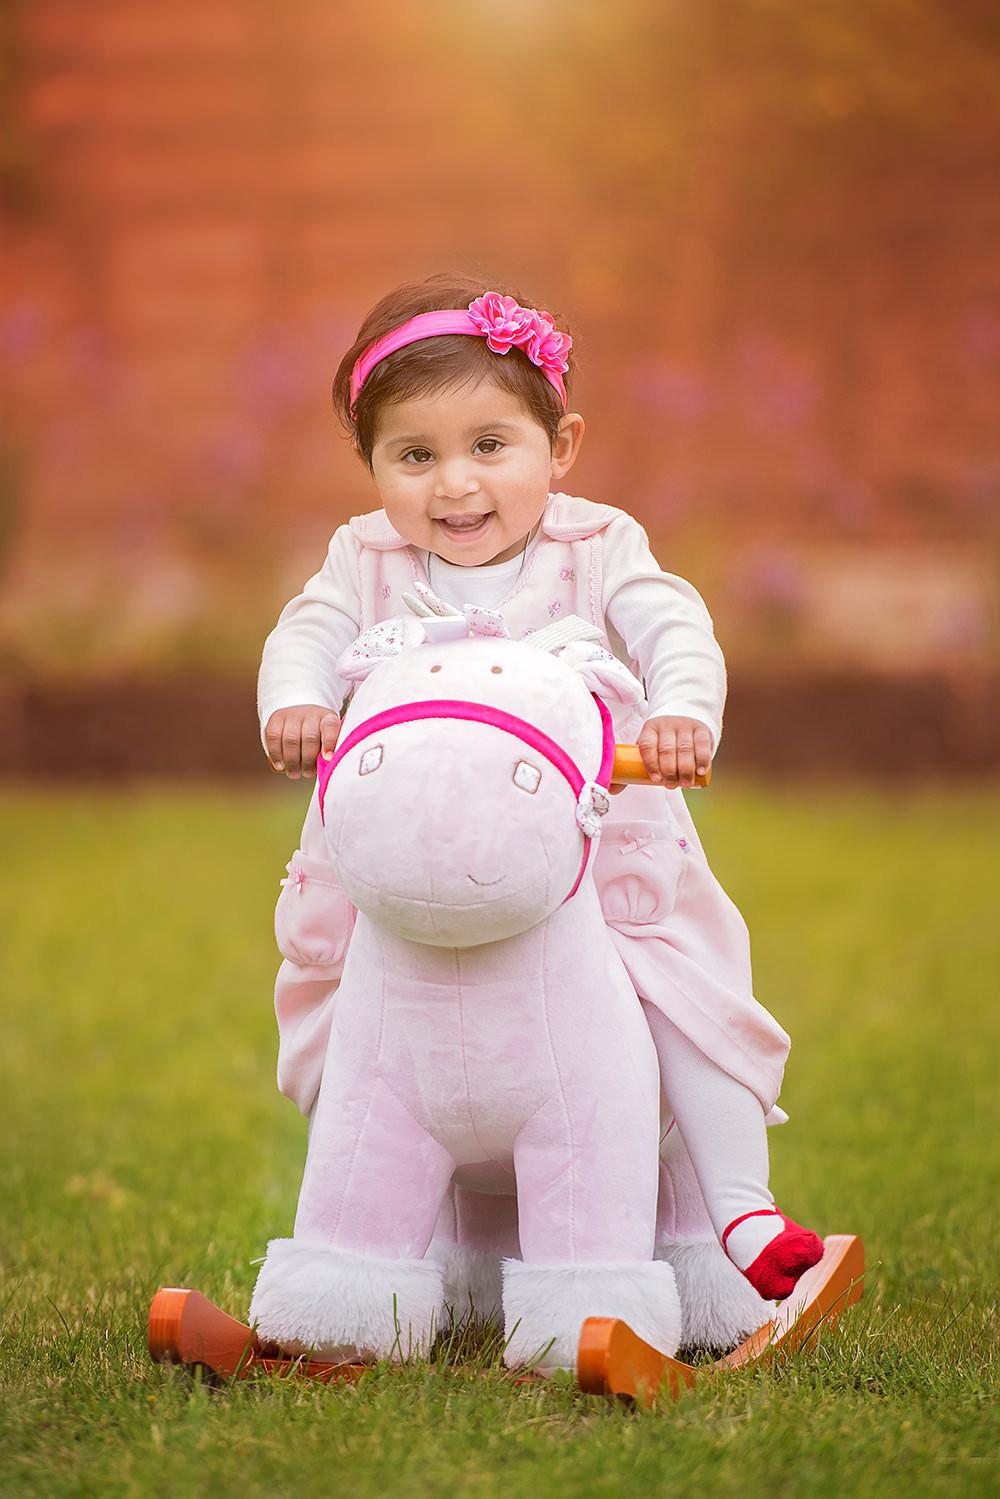 Baby Girl Portrait Photography.jpg